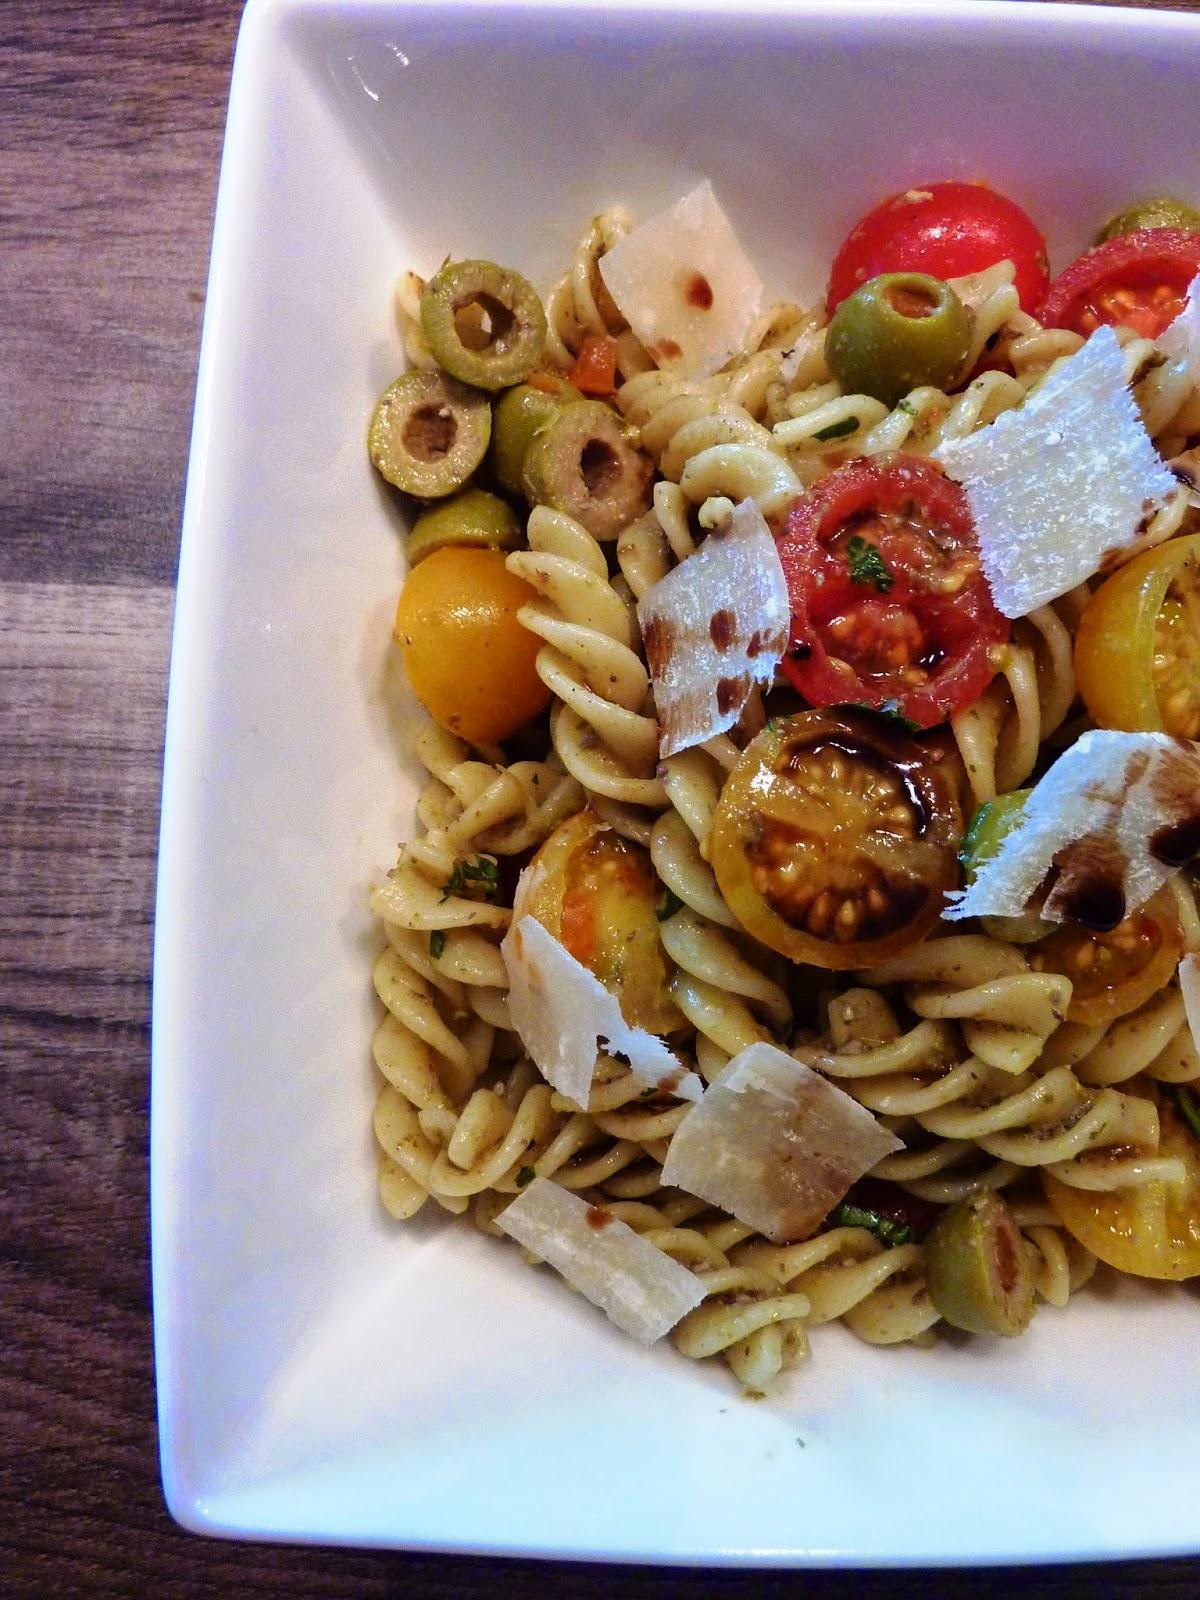 Salade de pâtes au pesto - Recette Weight Watchers Propoint | De ... - Salade Pates Pesto